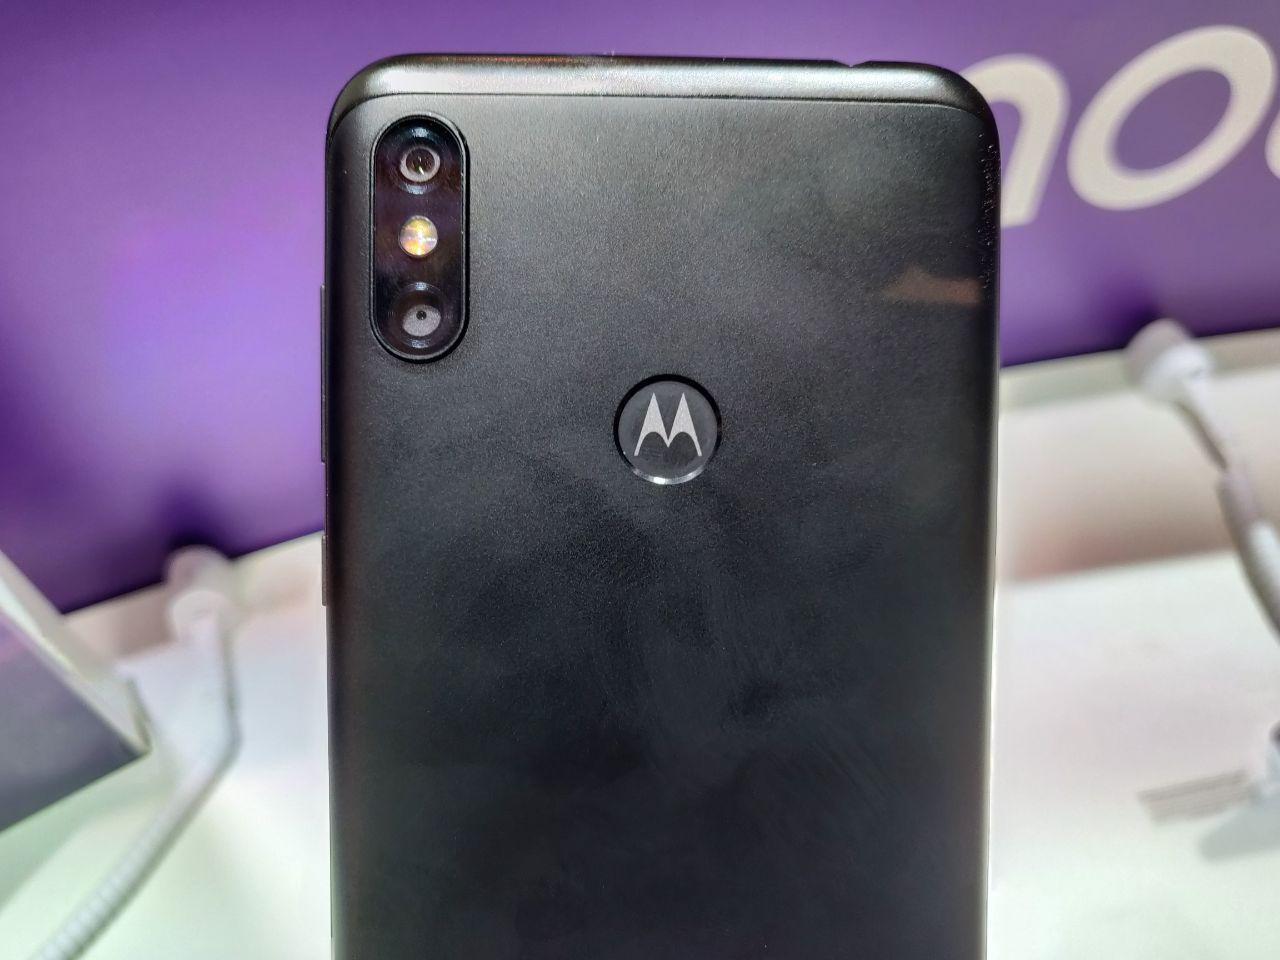 Motorola One и One Power—первые смартфоны бренда на Android One5